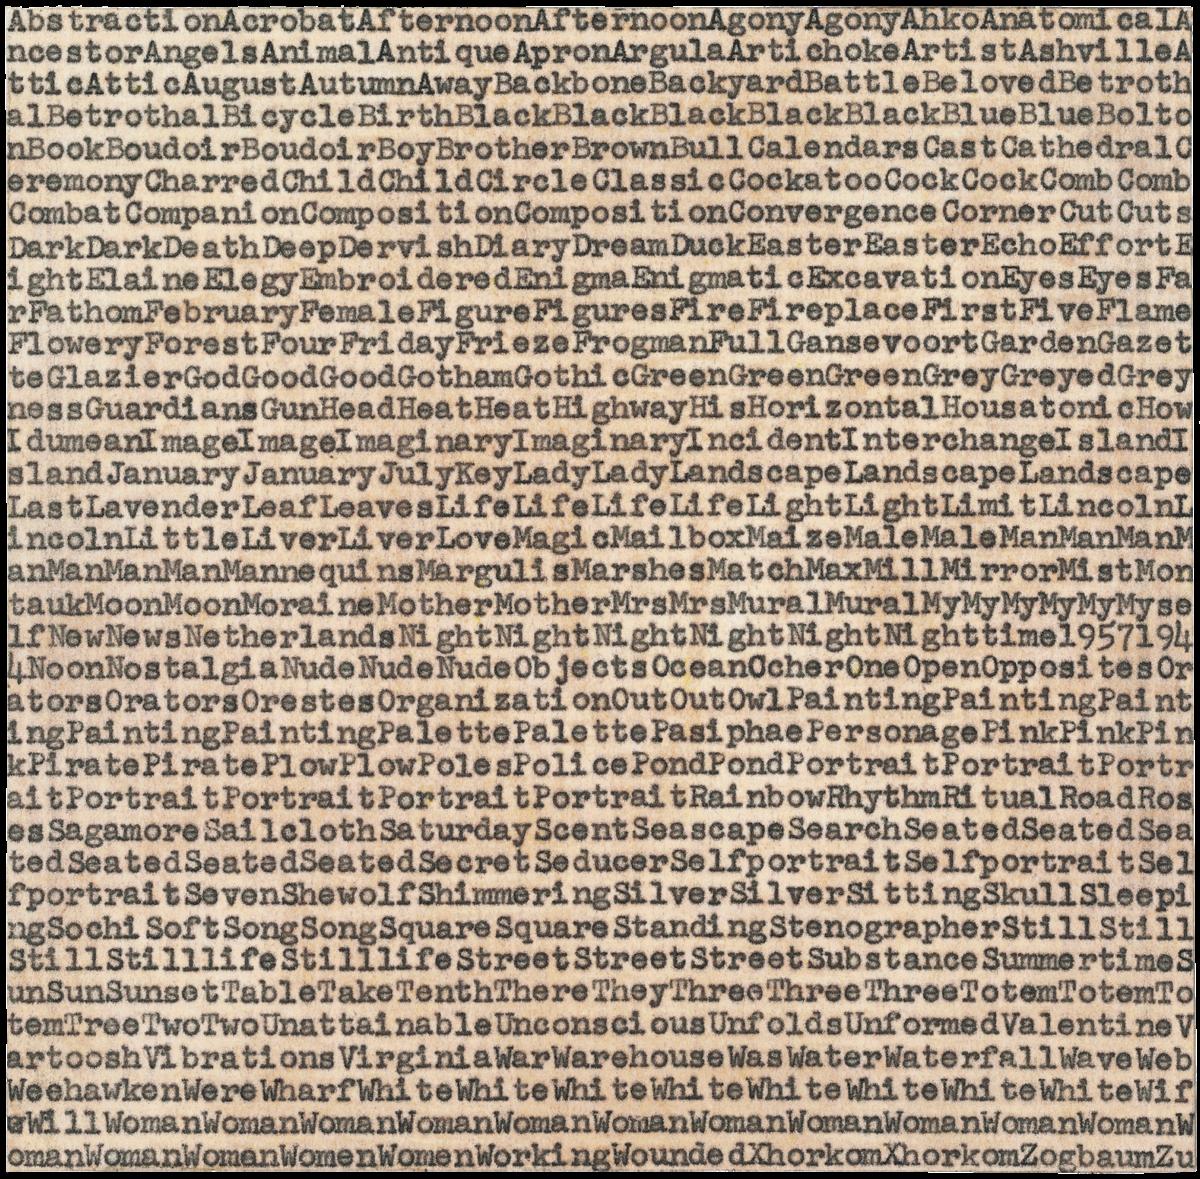 Carl Andre De Kooning Gorky Pollock carbon copy print for sale